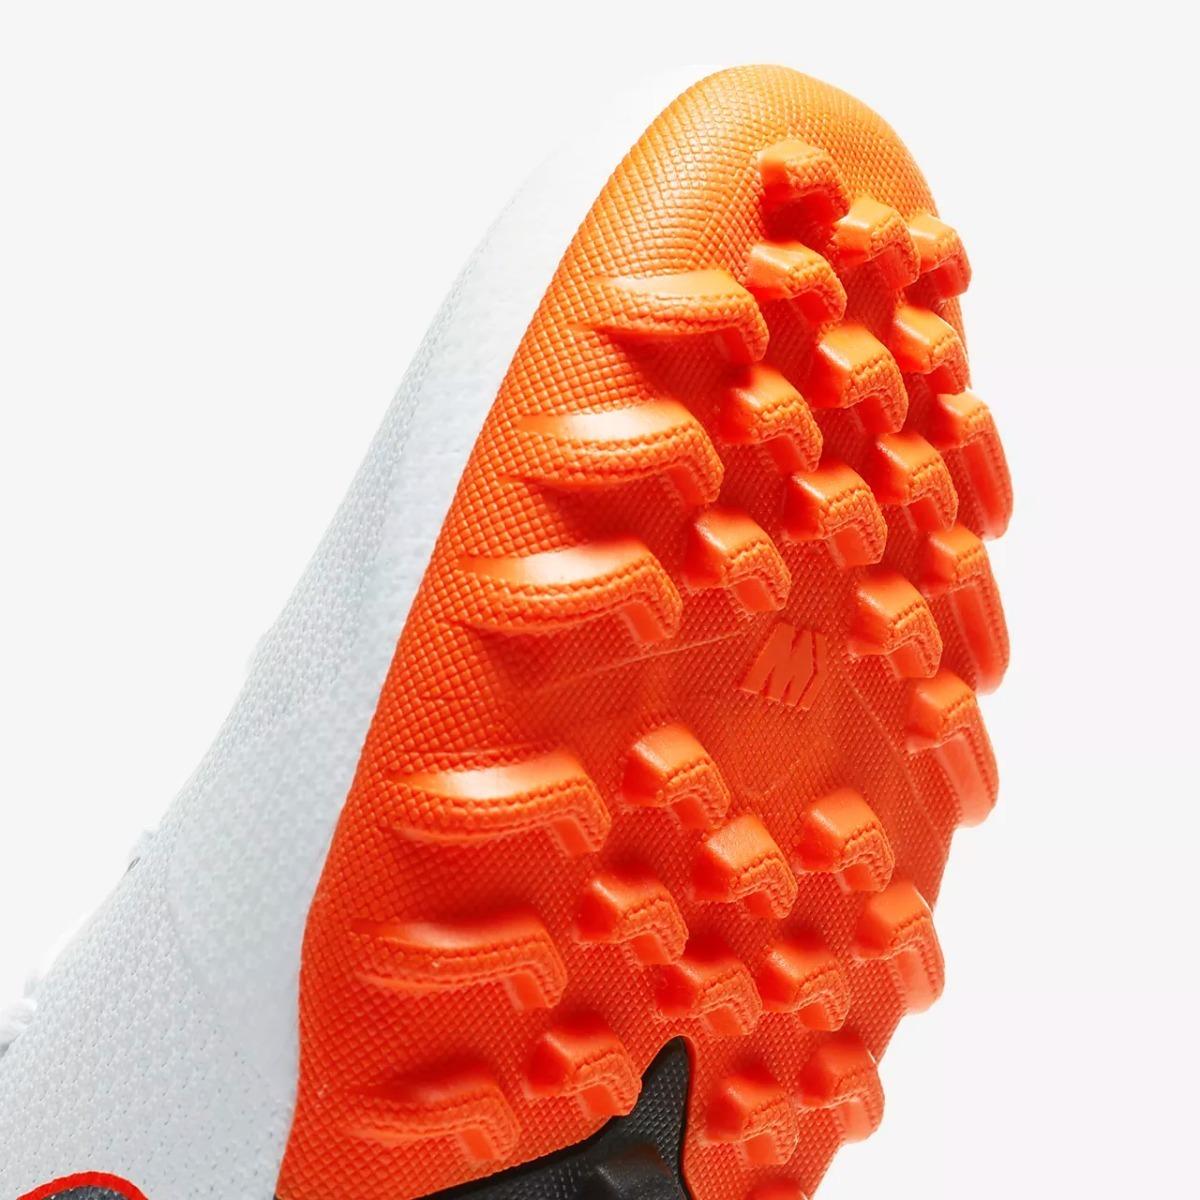 botas nike mercurial superfly blancos futbol rapido turf. Cargando zoom. 937191caa5762